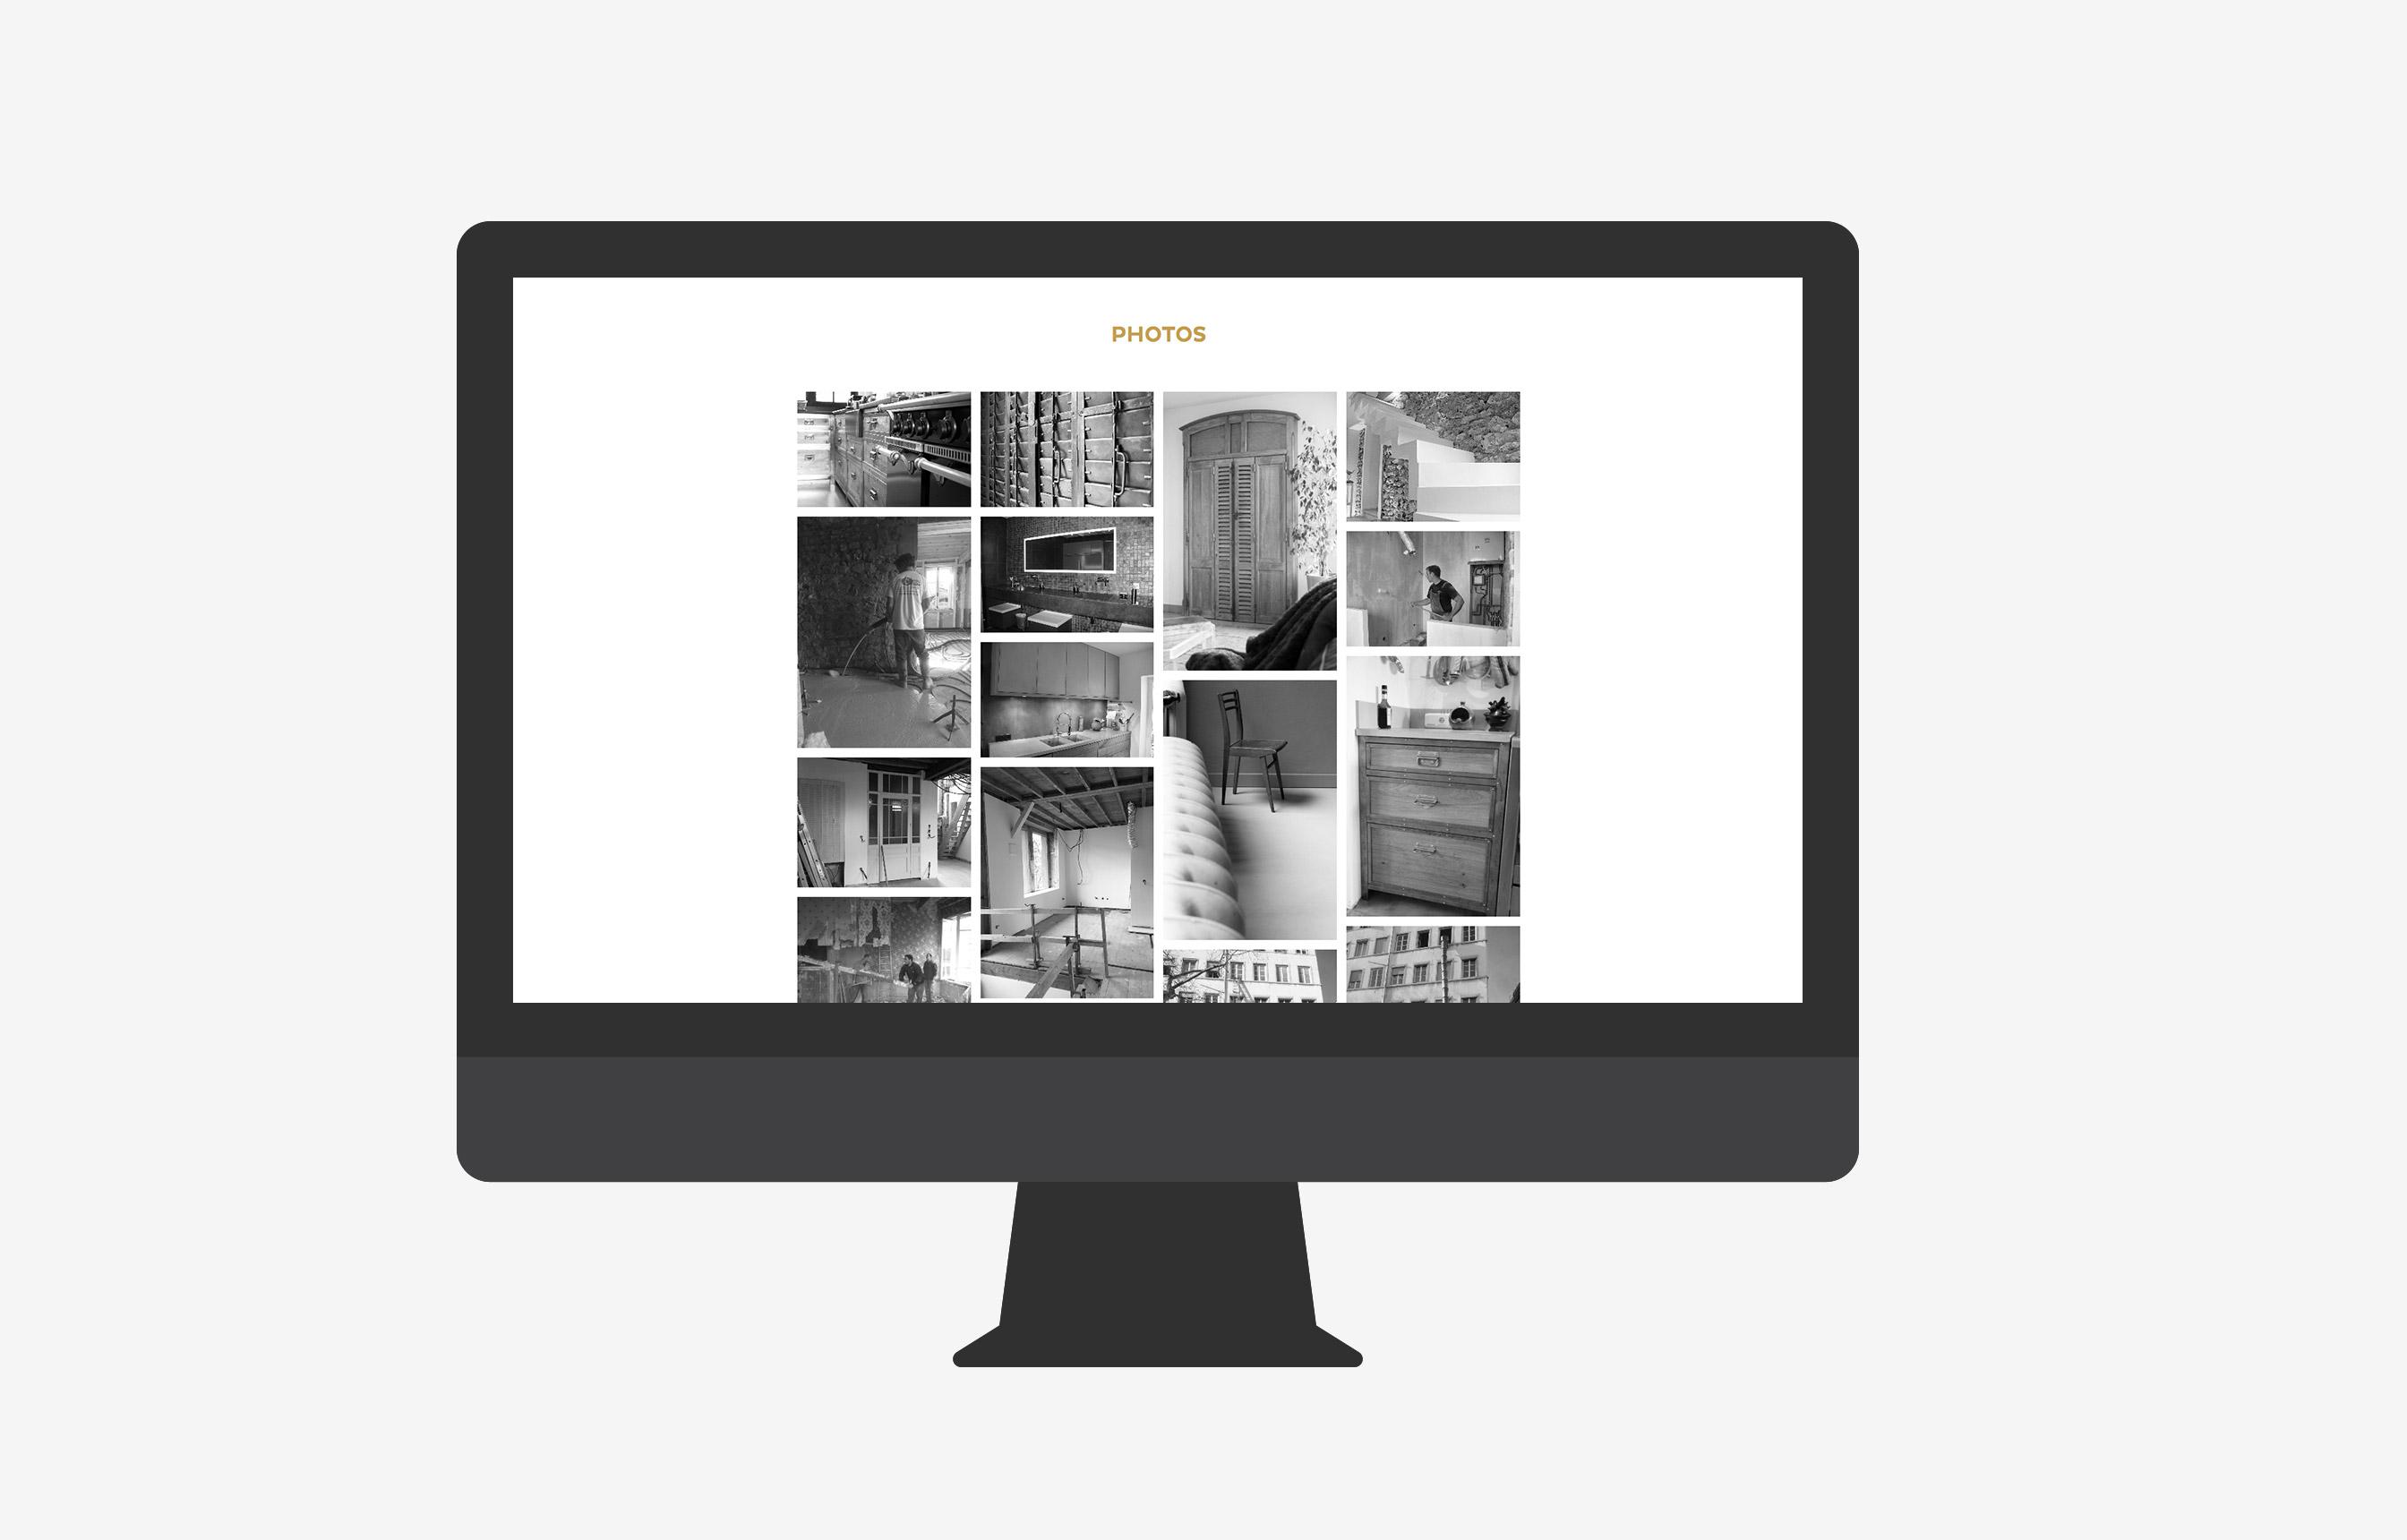 02-lafarelle-pikteo-webdesign-graphic-design-freelance-paris-bruxelles-londres